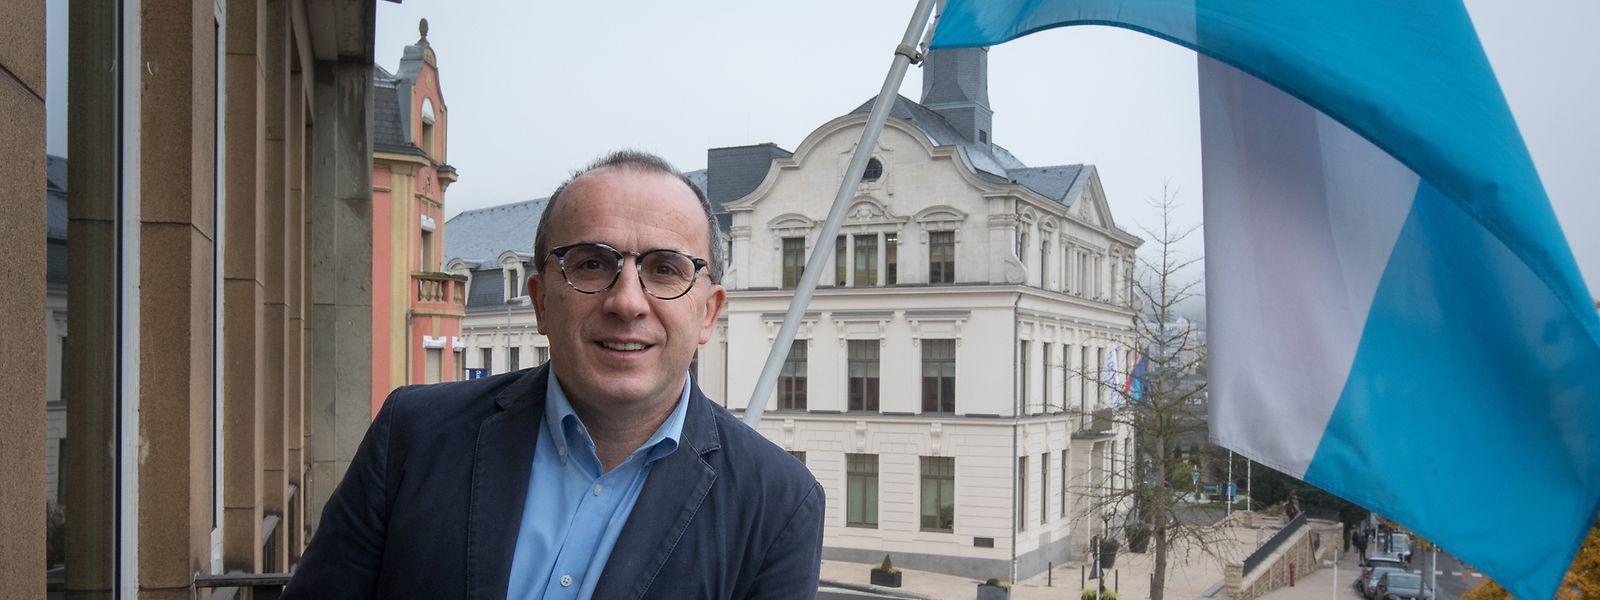 Roberto Traversini bleibt Bürgermeister.